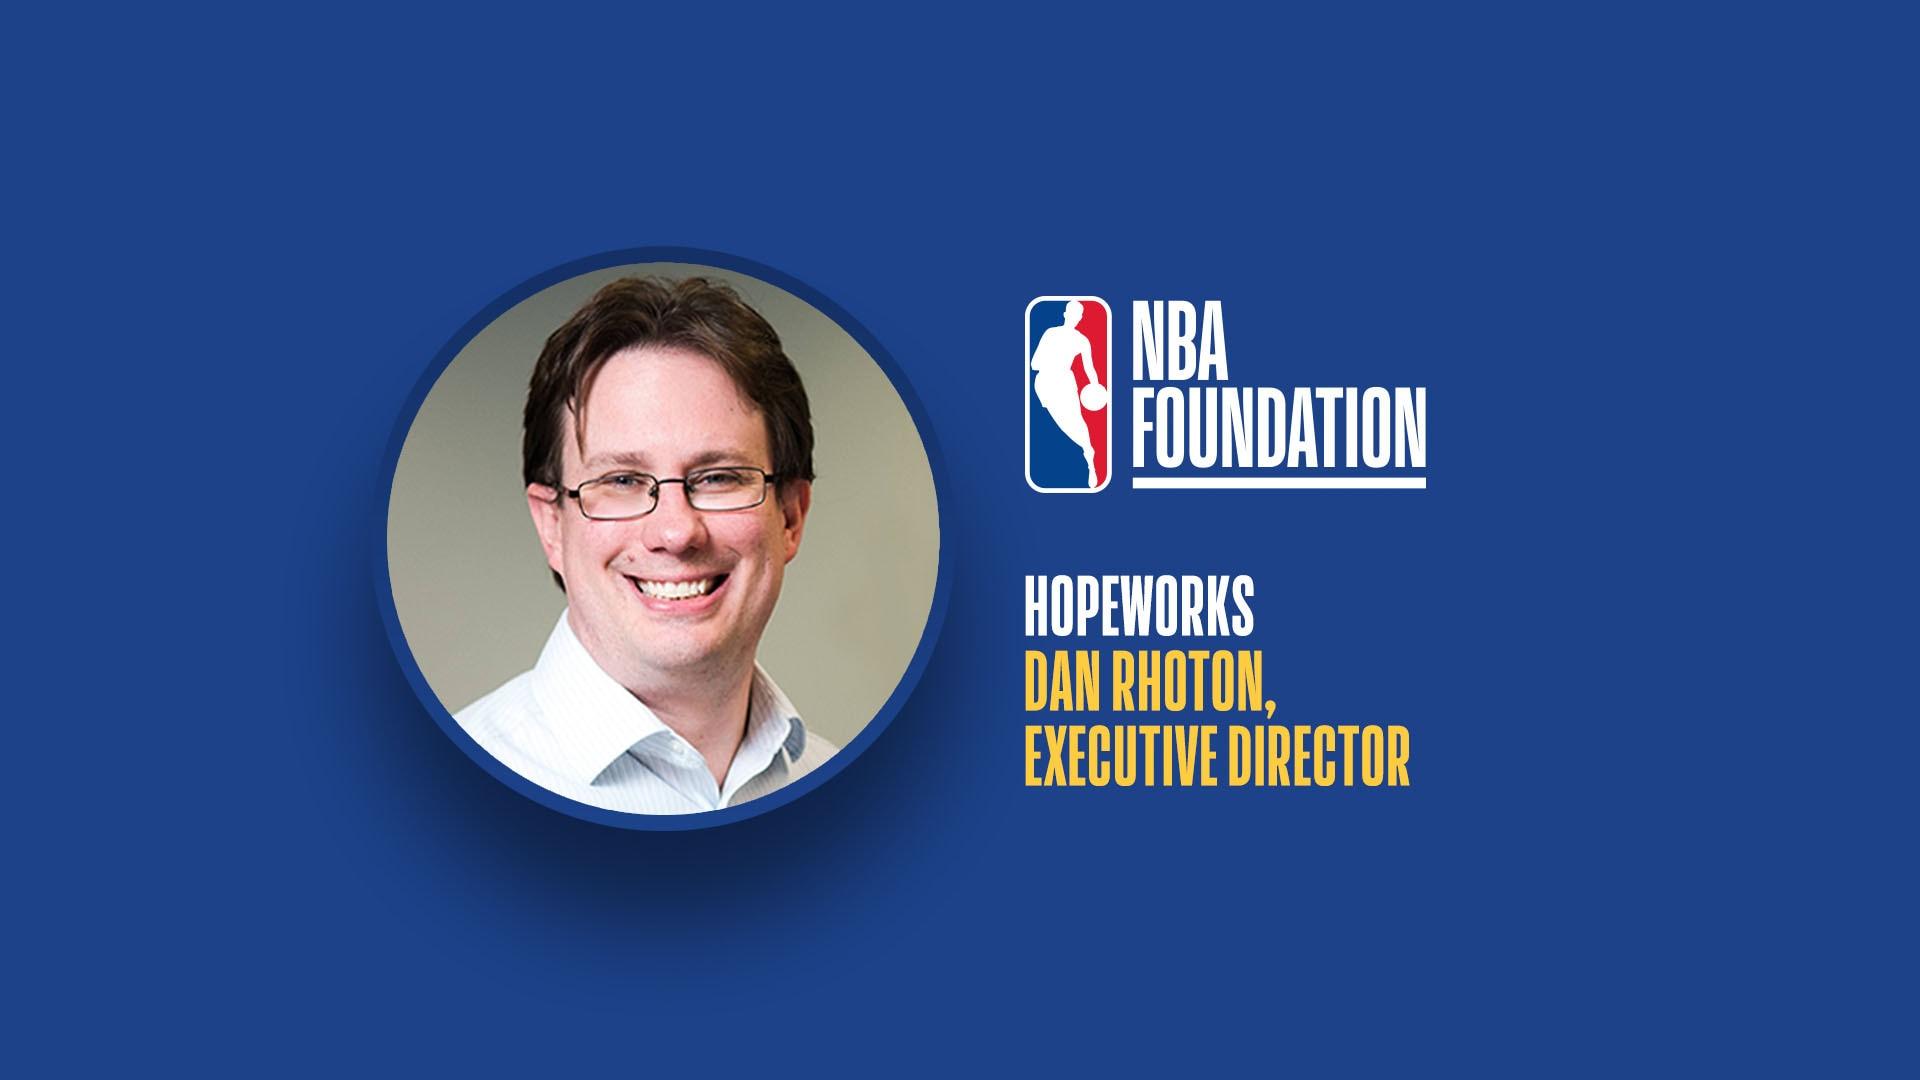 NBA Foundation grantee spotlight: Hopeworks